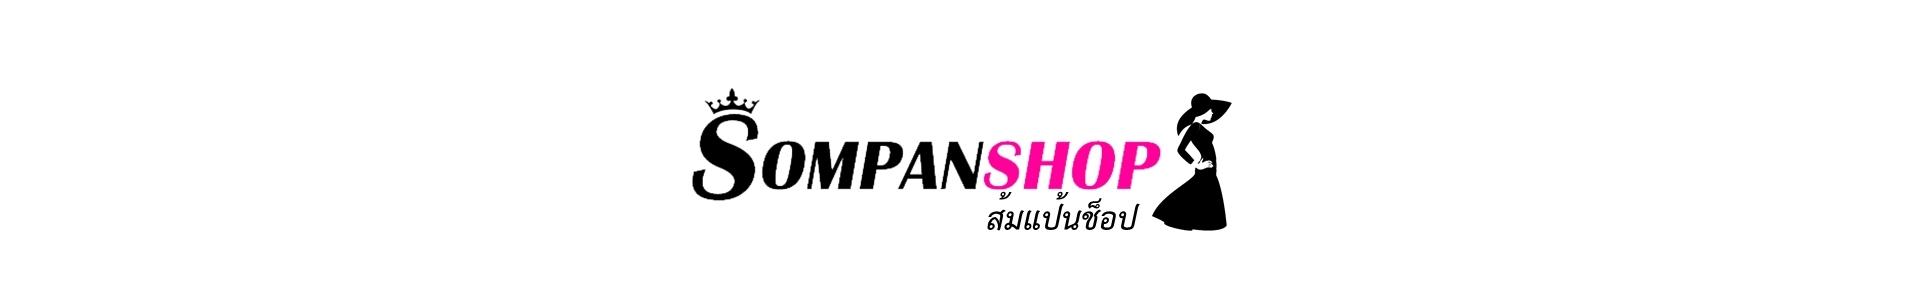 Sompanshop ร้านส้มแป้นช็อป